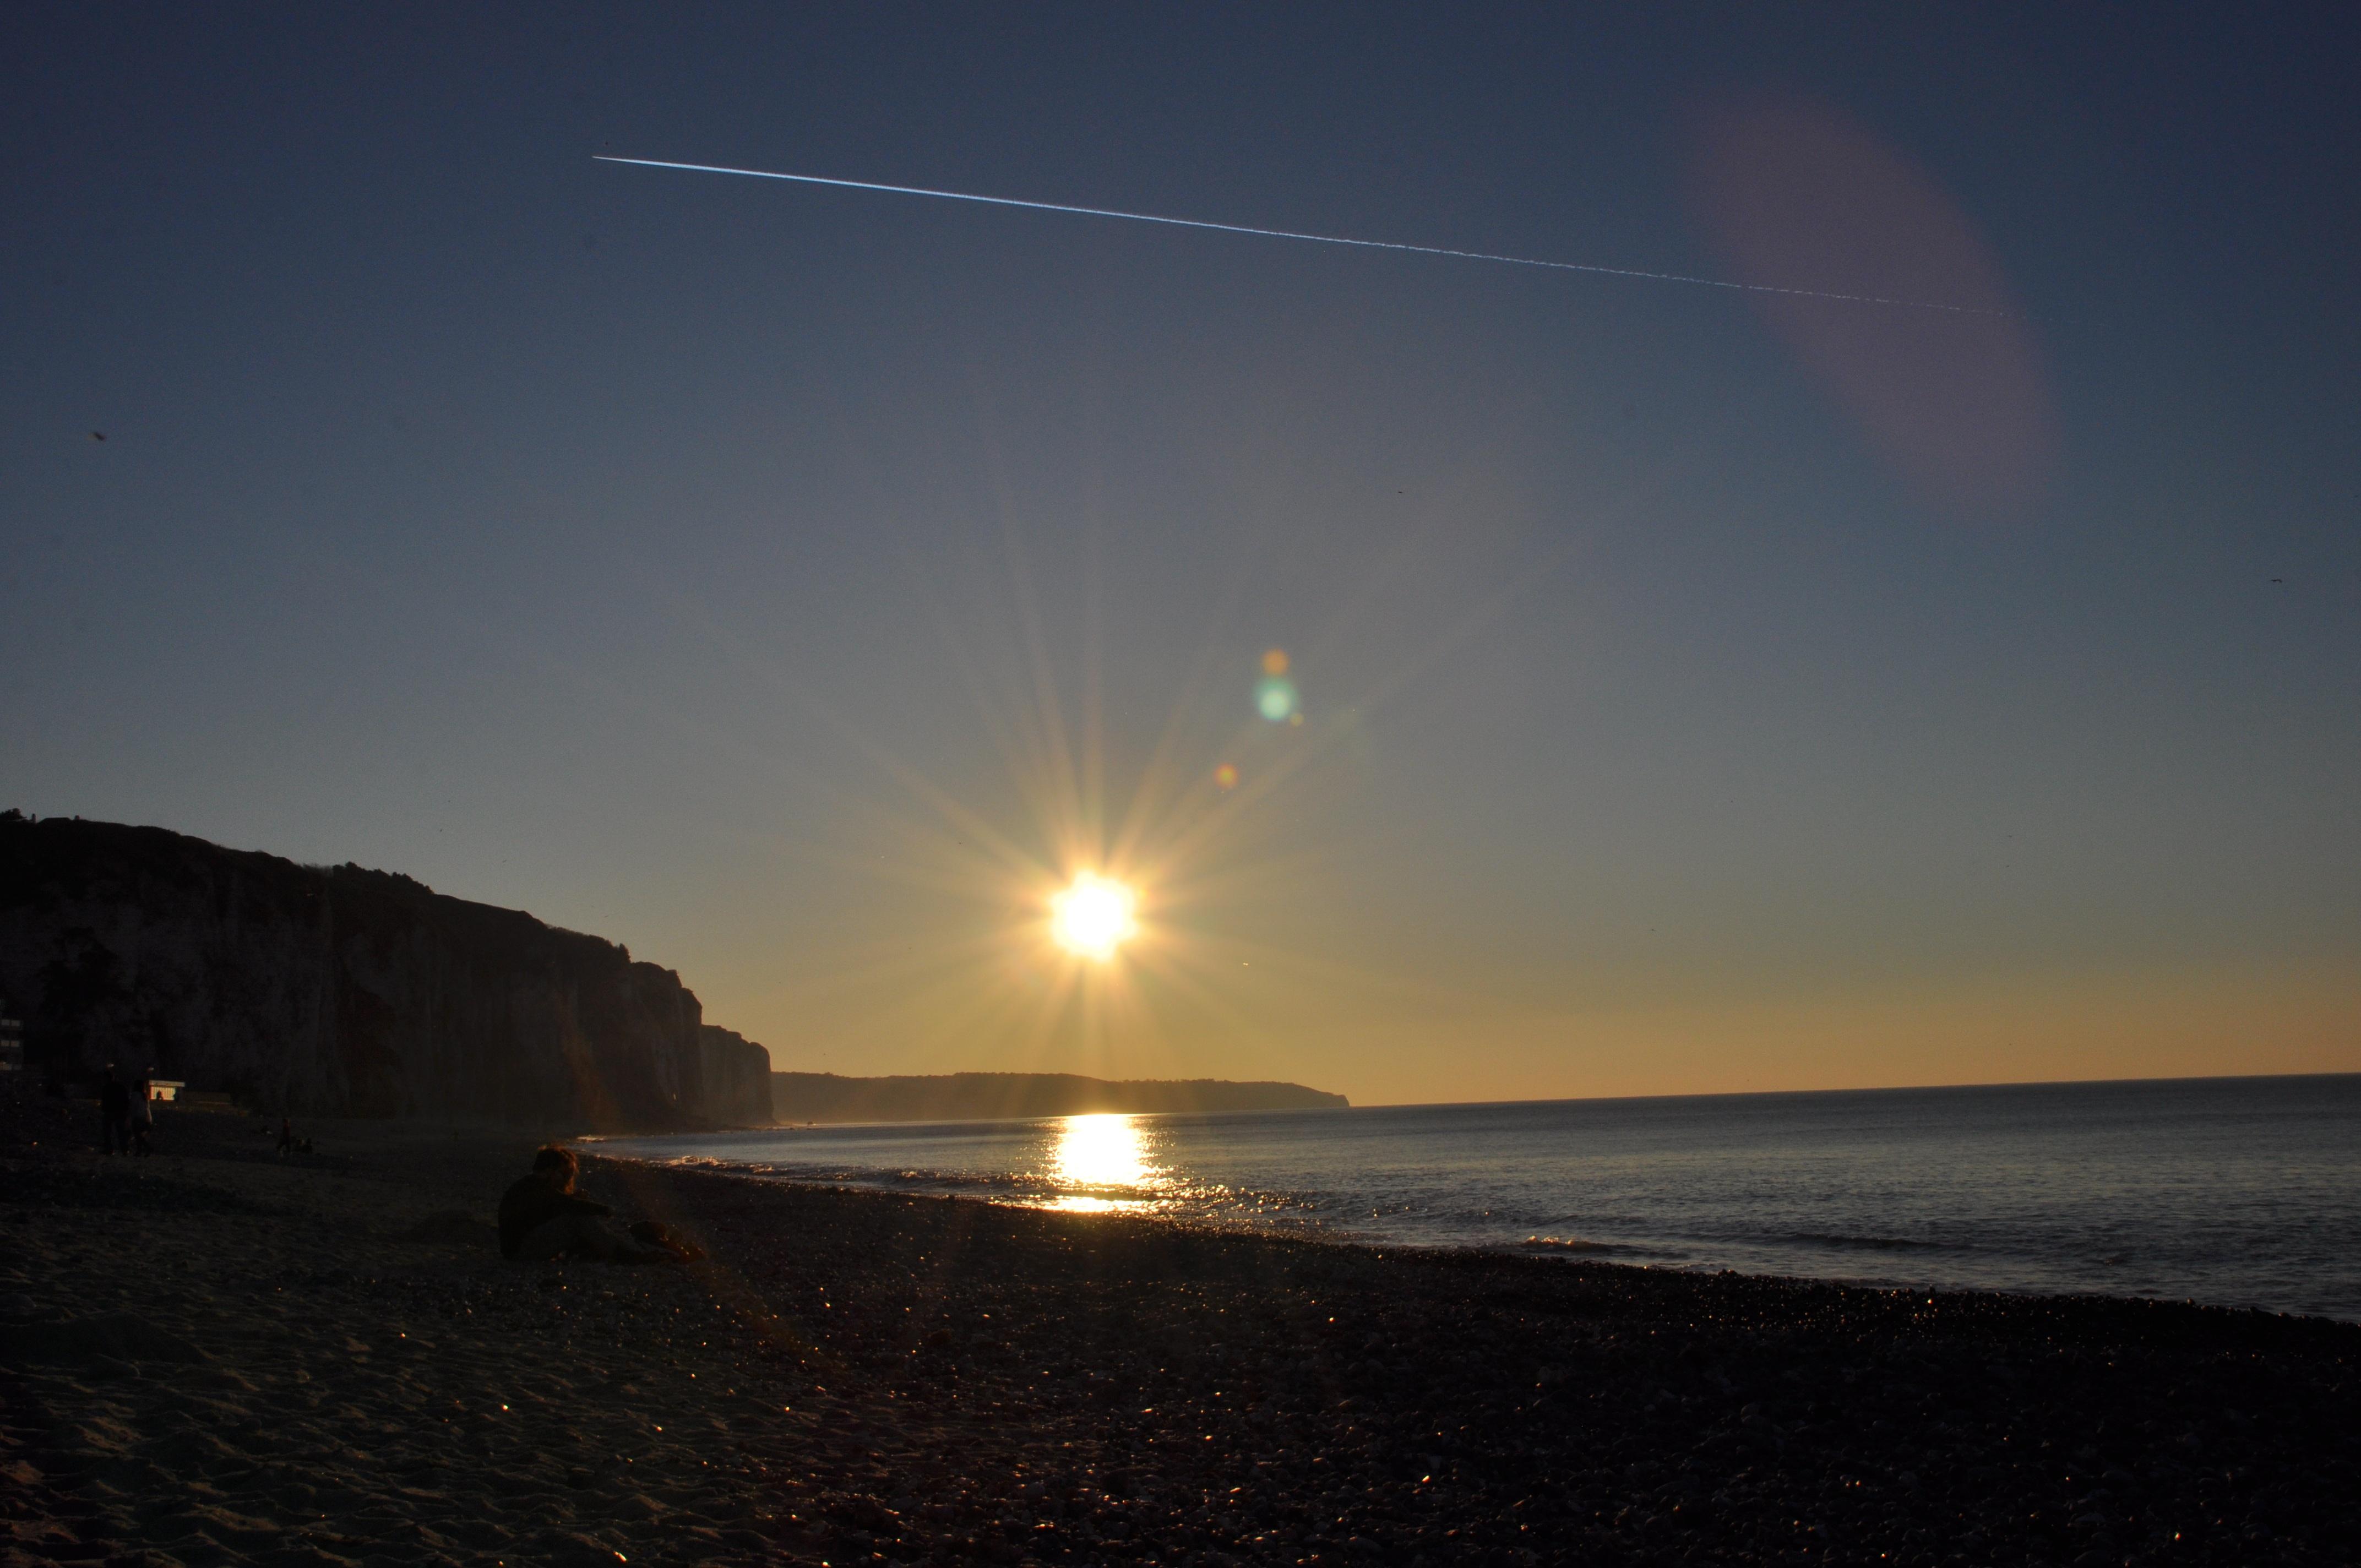 Free Images Beach Landscape Coast Water Nature Ocean Horizon Light Sky Sun Sunrise Night Sunlight Morning Wave Dawn Cliff Seaside Dusk